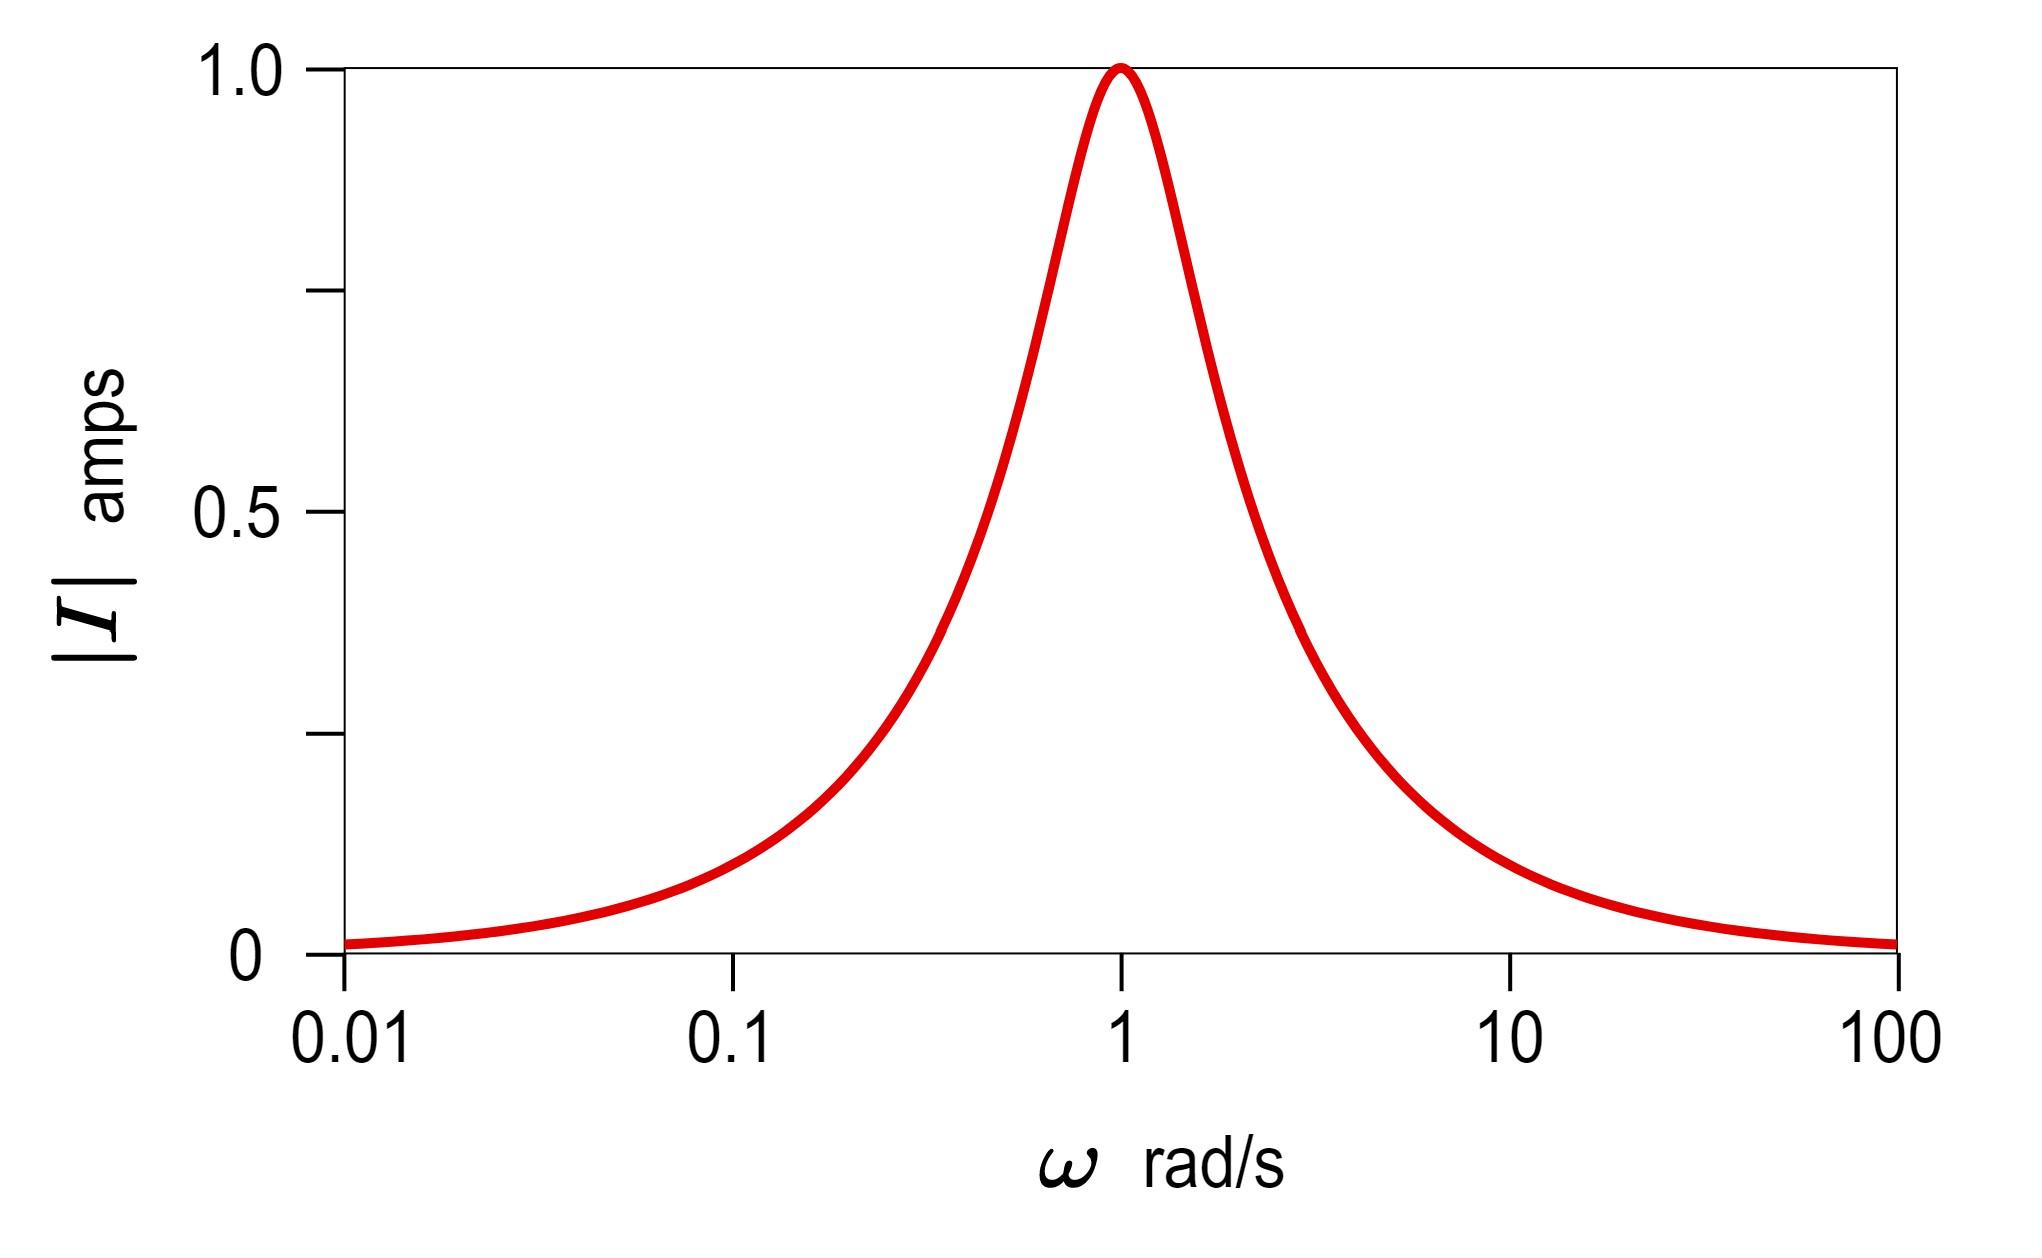 Series RLC damped driven oscillator response at resonance